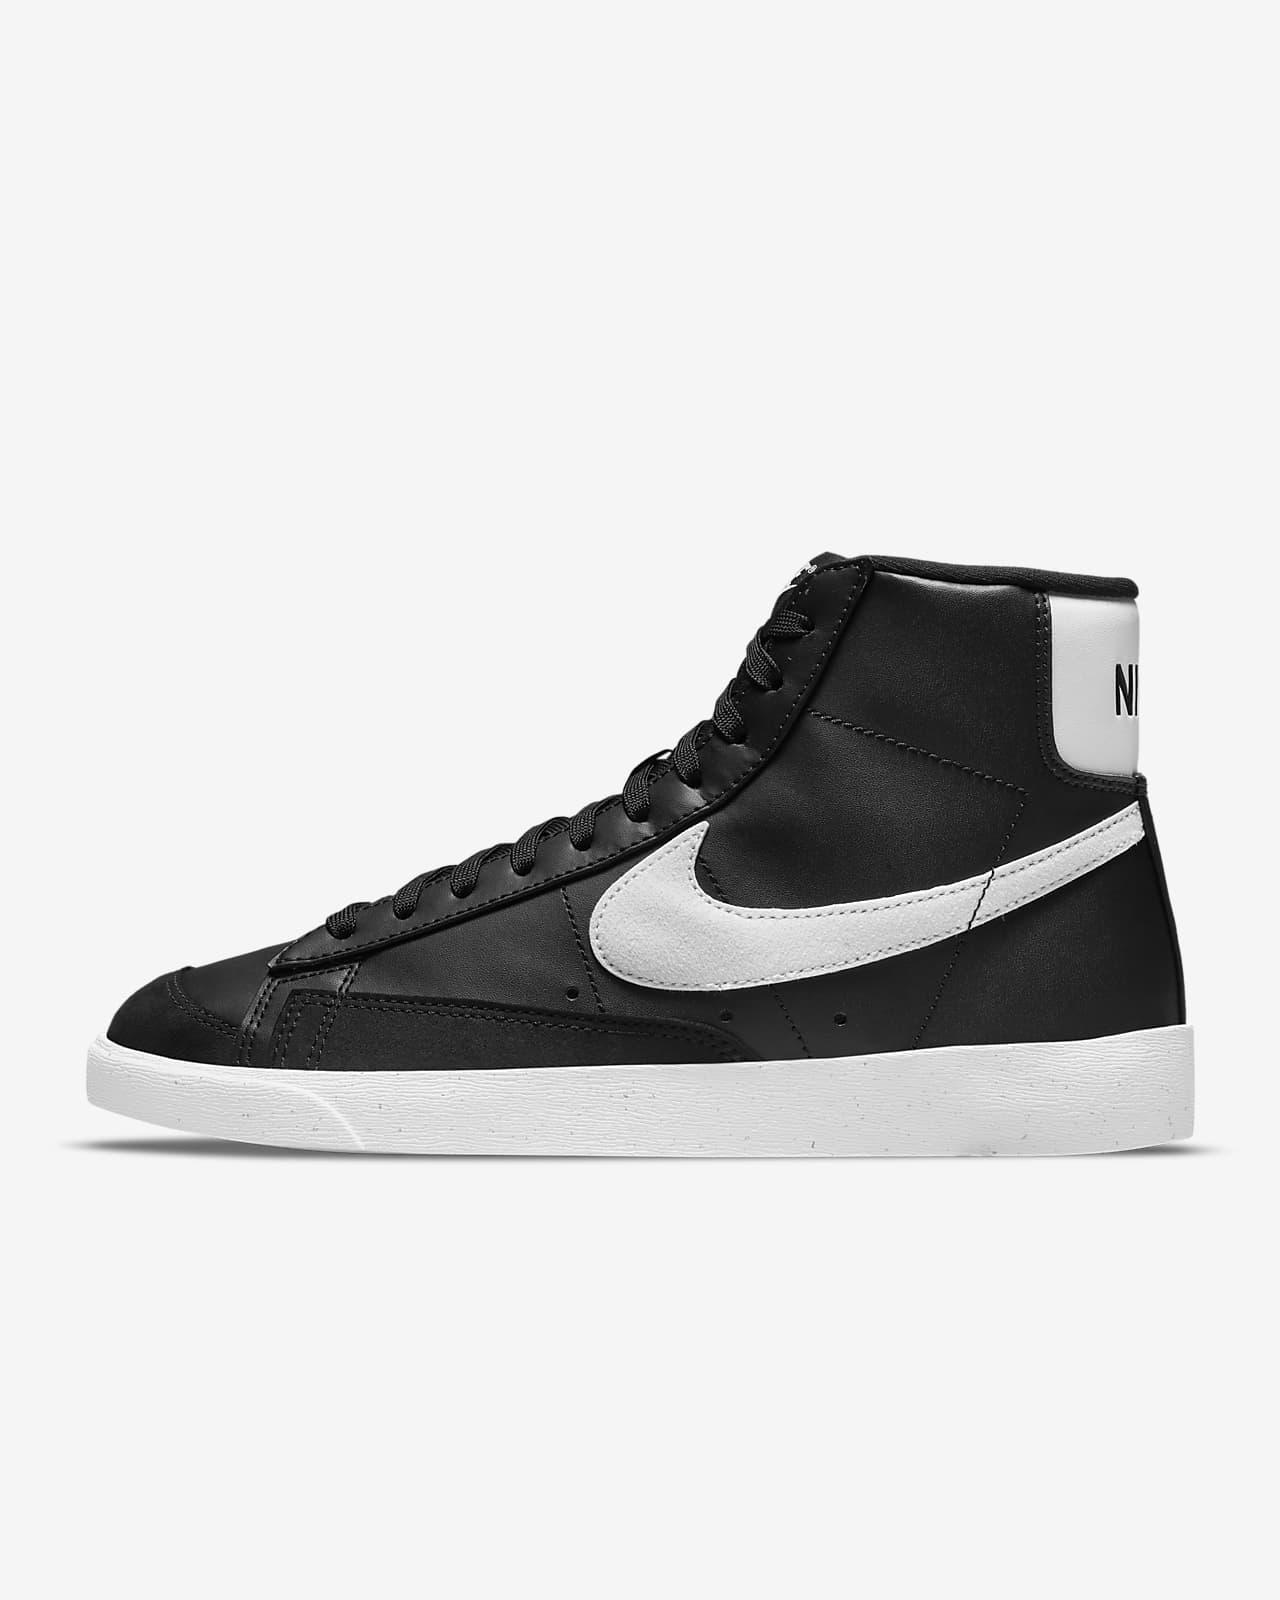 Chaussure Nike Blazer Mid '77 Next Nature pour Femme